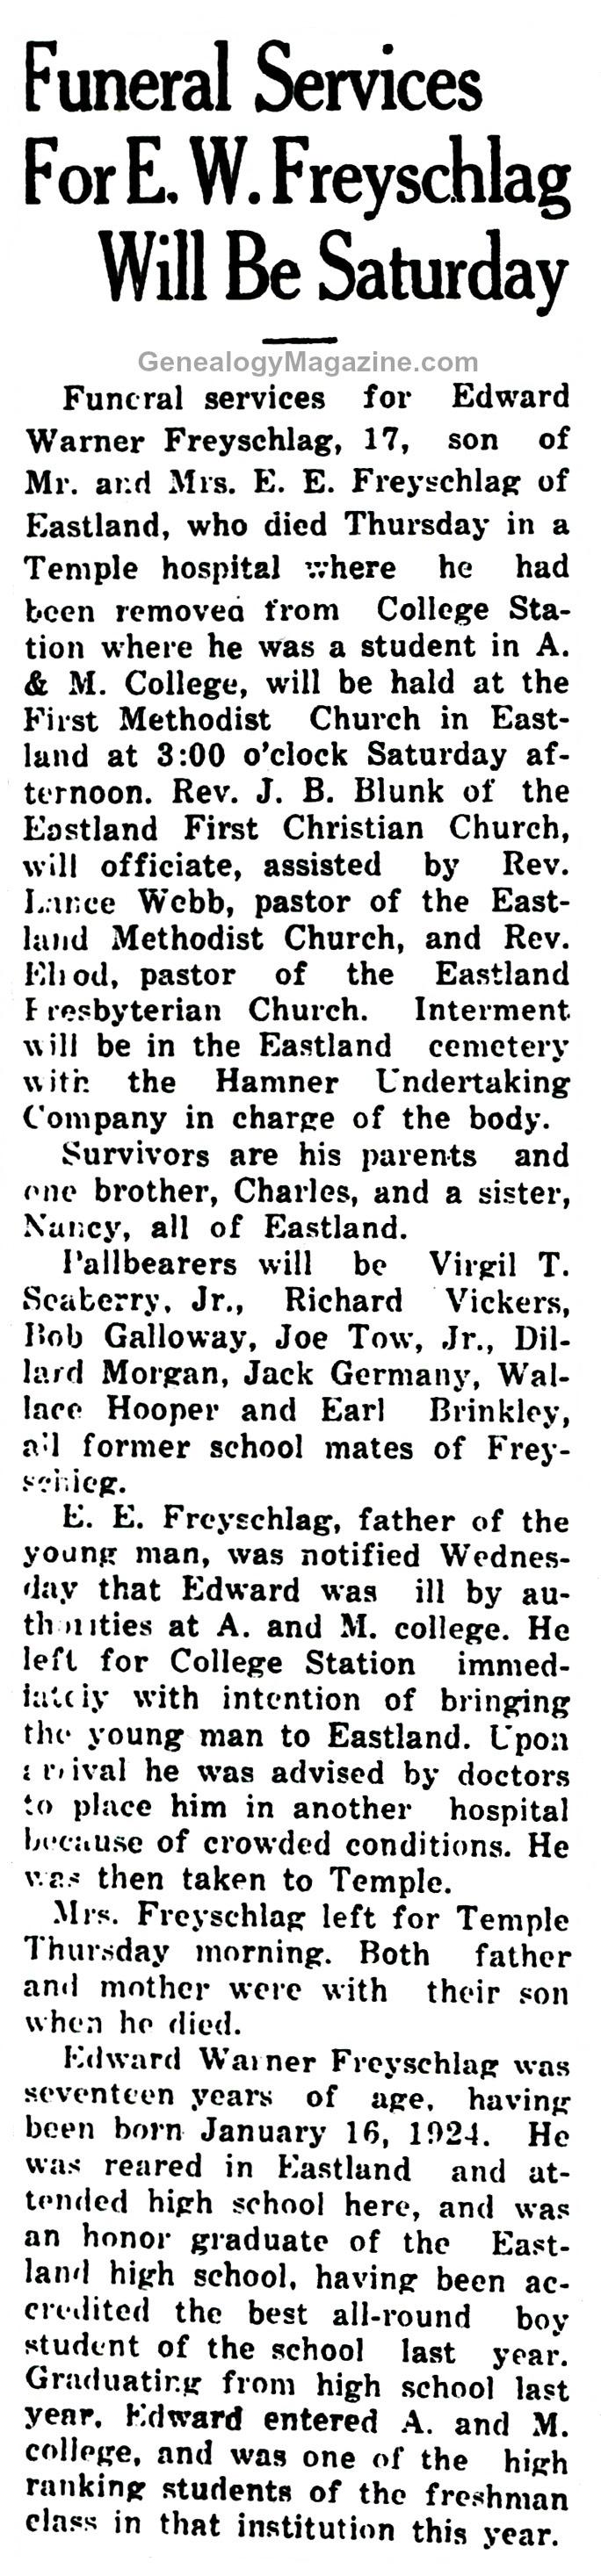 FREYSCHLAG, Edward Varner obituary